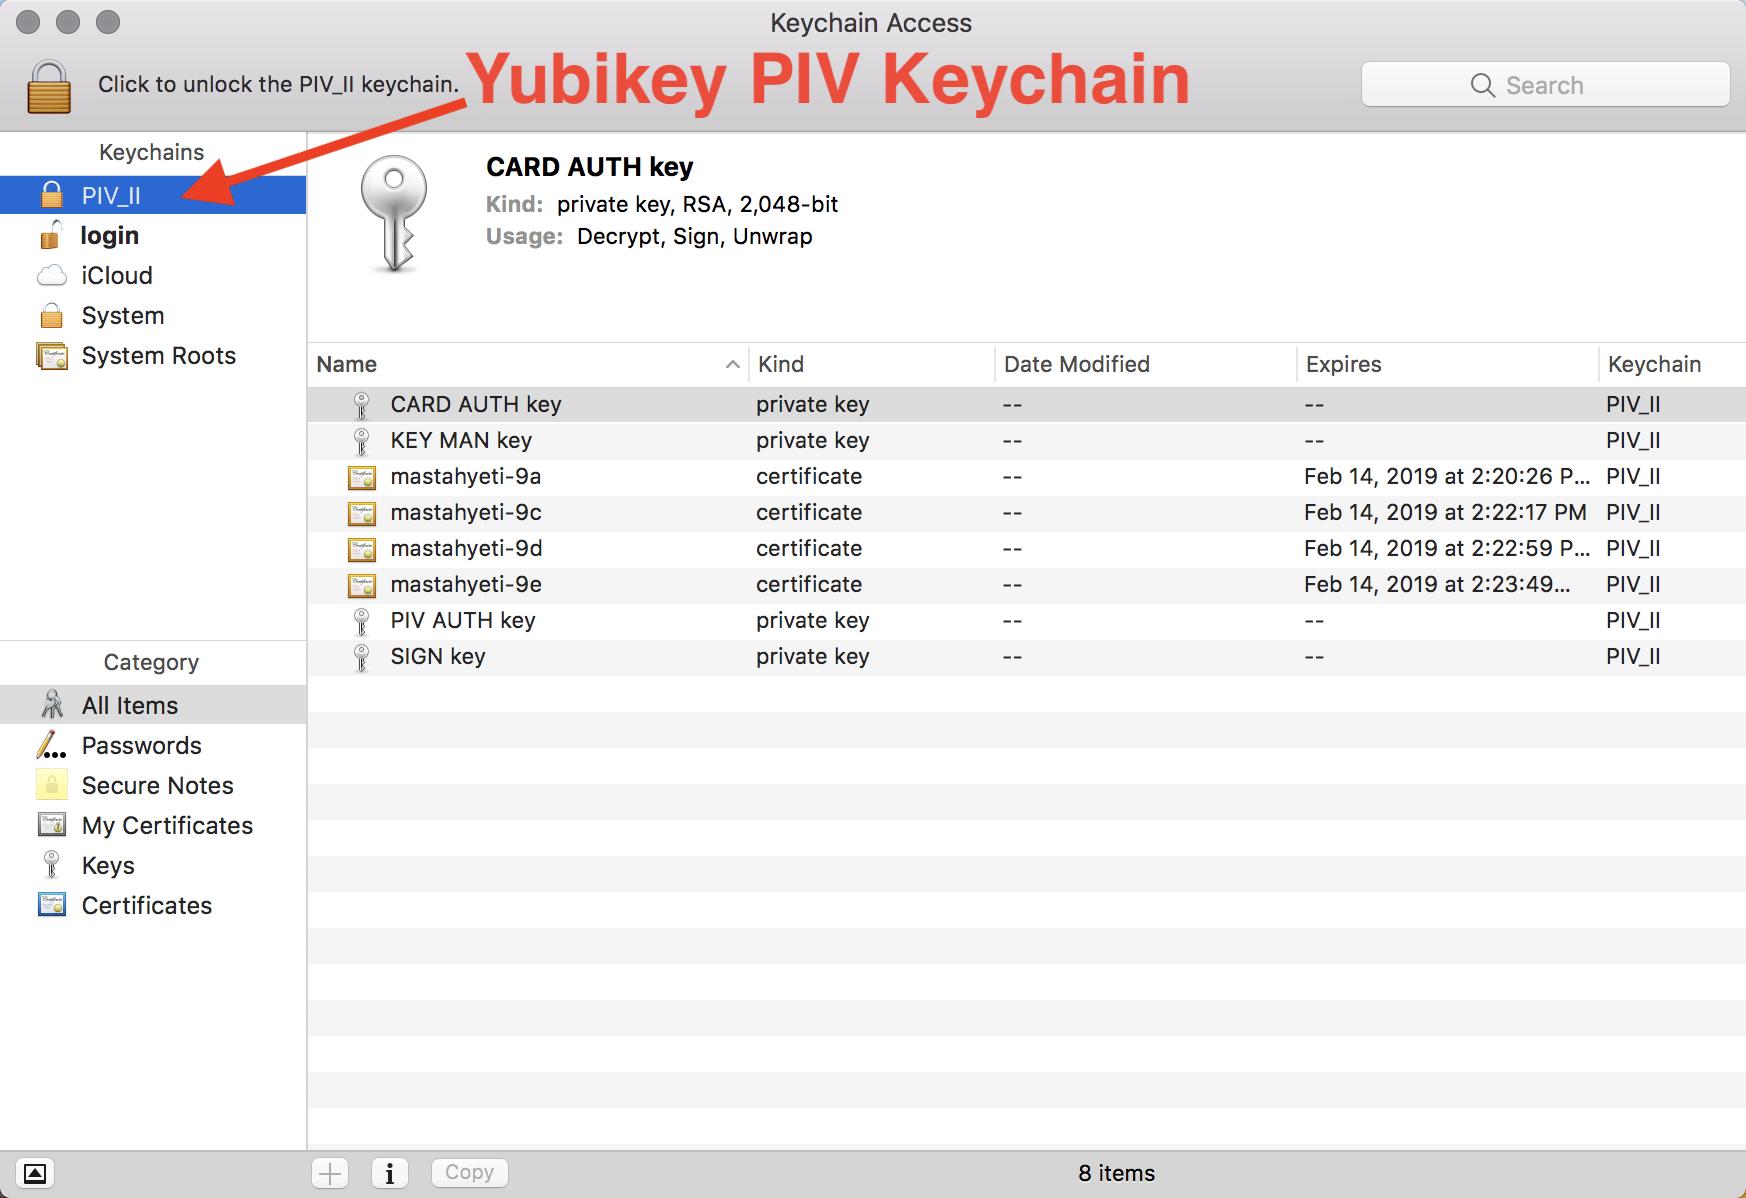 Yubikey PIV Keychain in macOS Keychain Access app